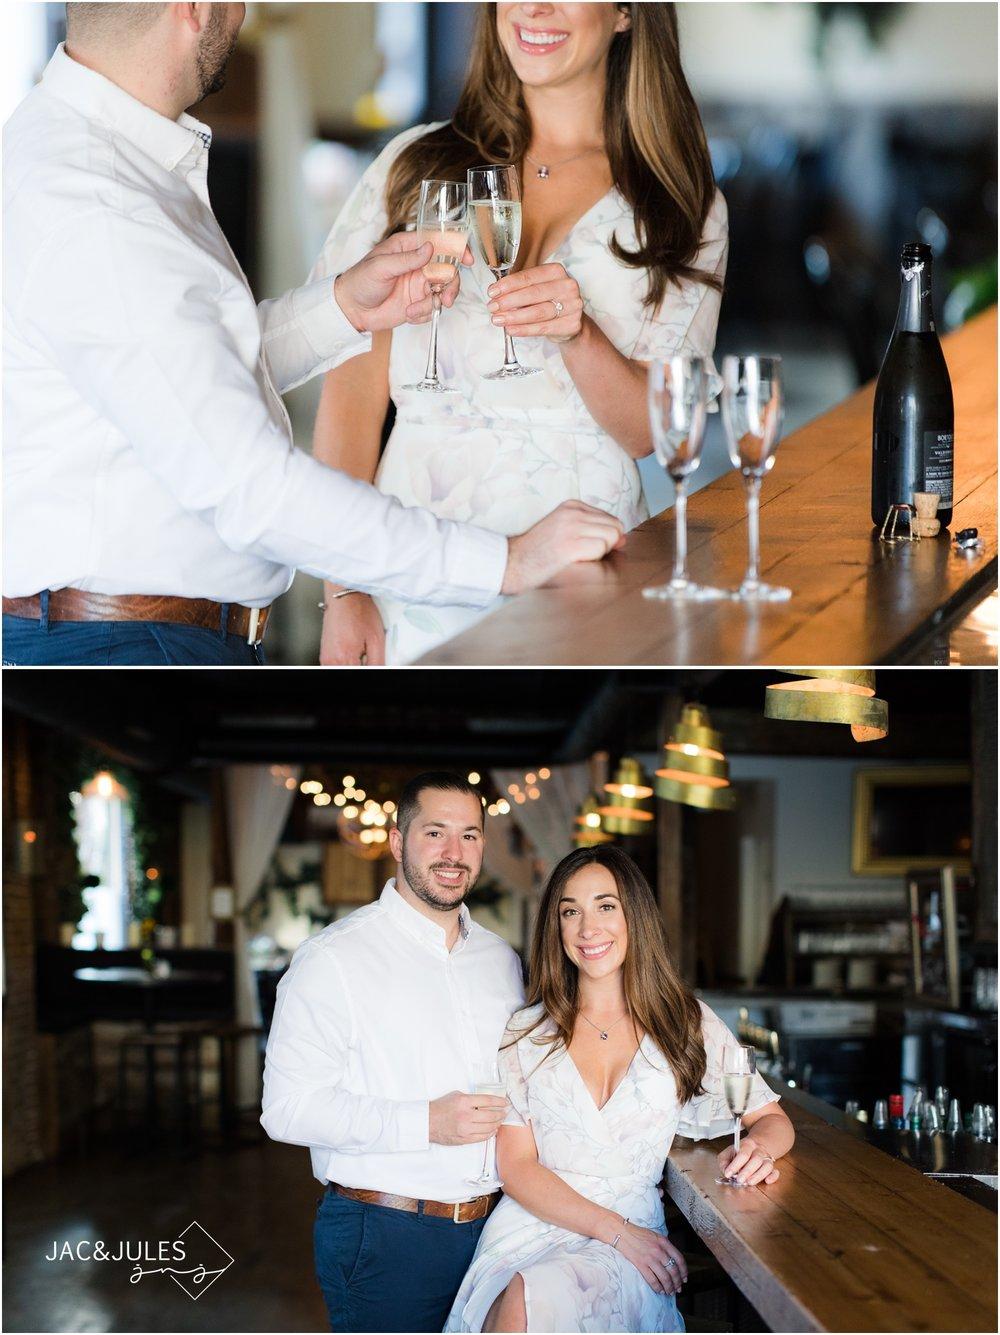 Engagement photos at Grand Vin in Hoboken, NJ.